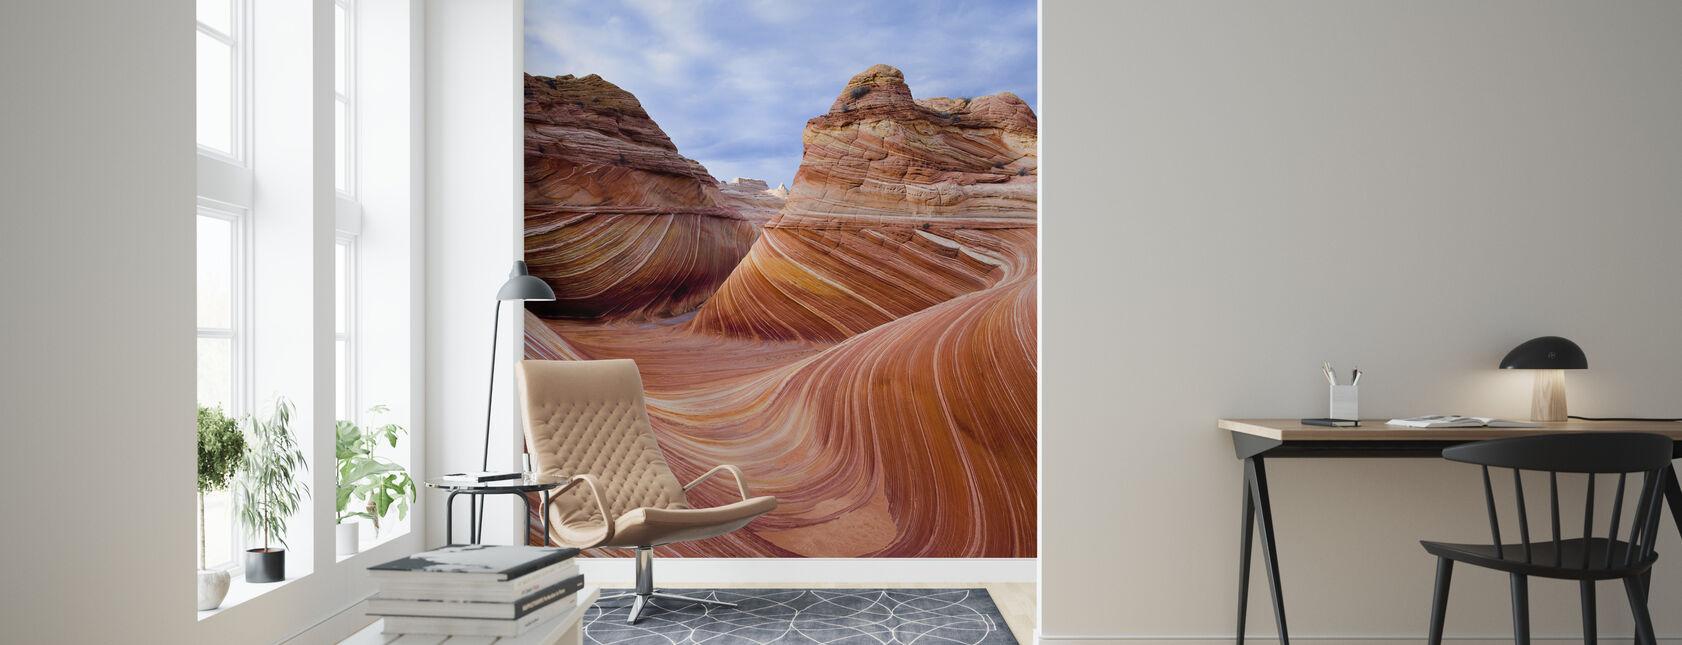 Twisted Sandstone Curves, Vermilion Cliffs, Arizona - Wallpaper - Living Room